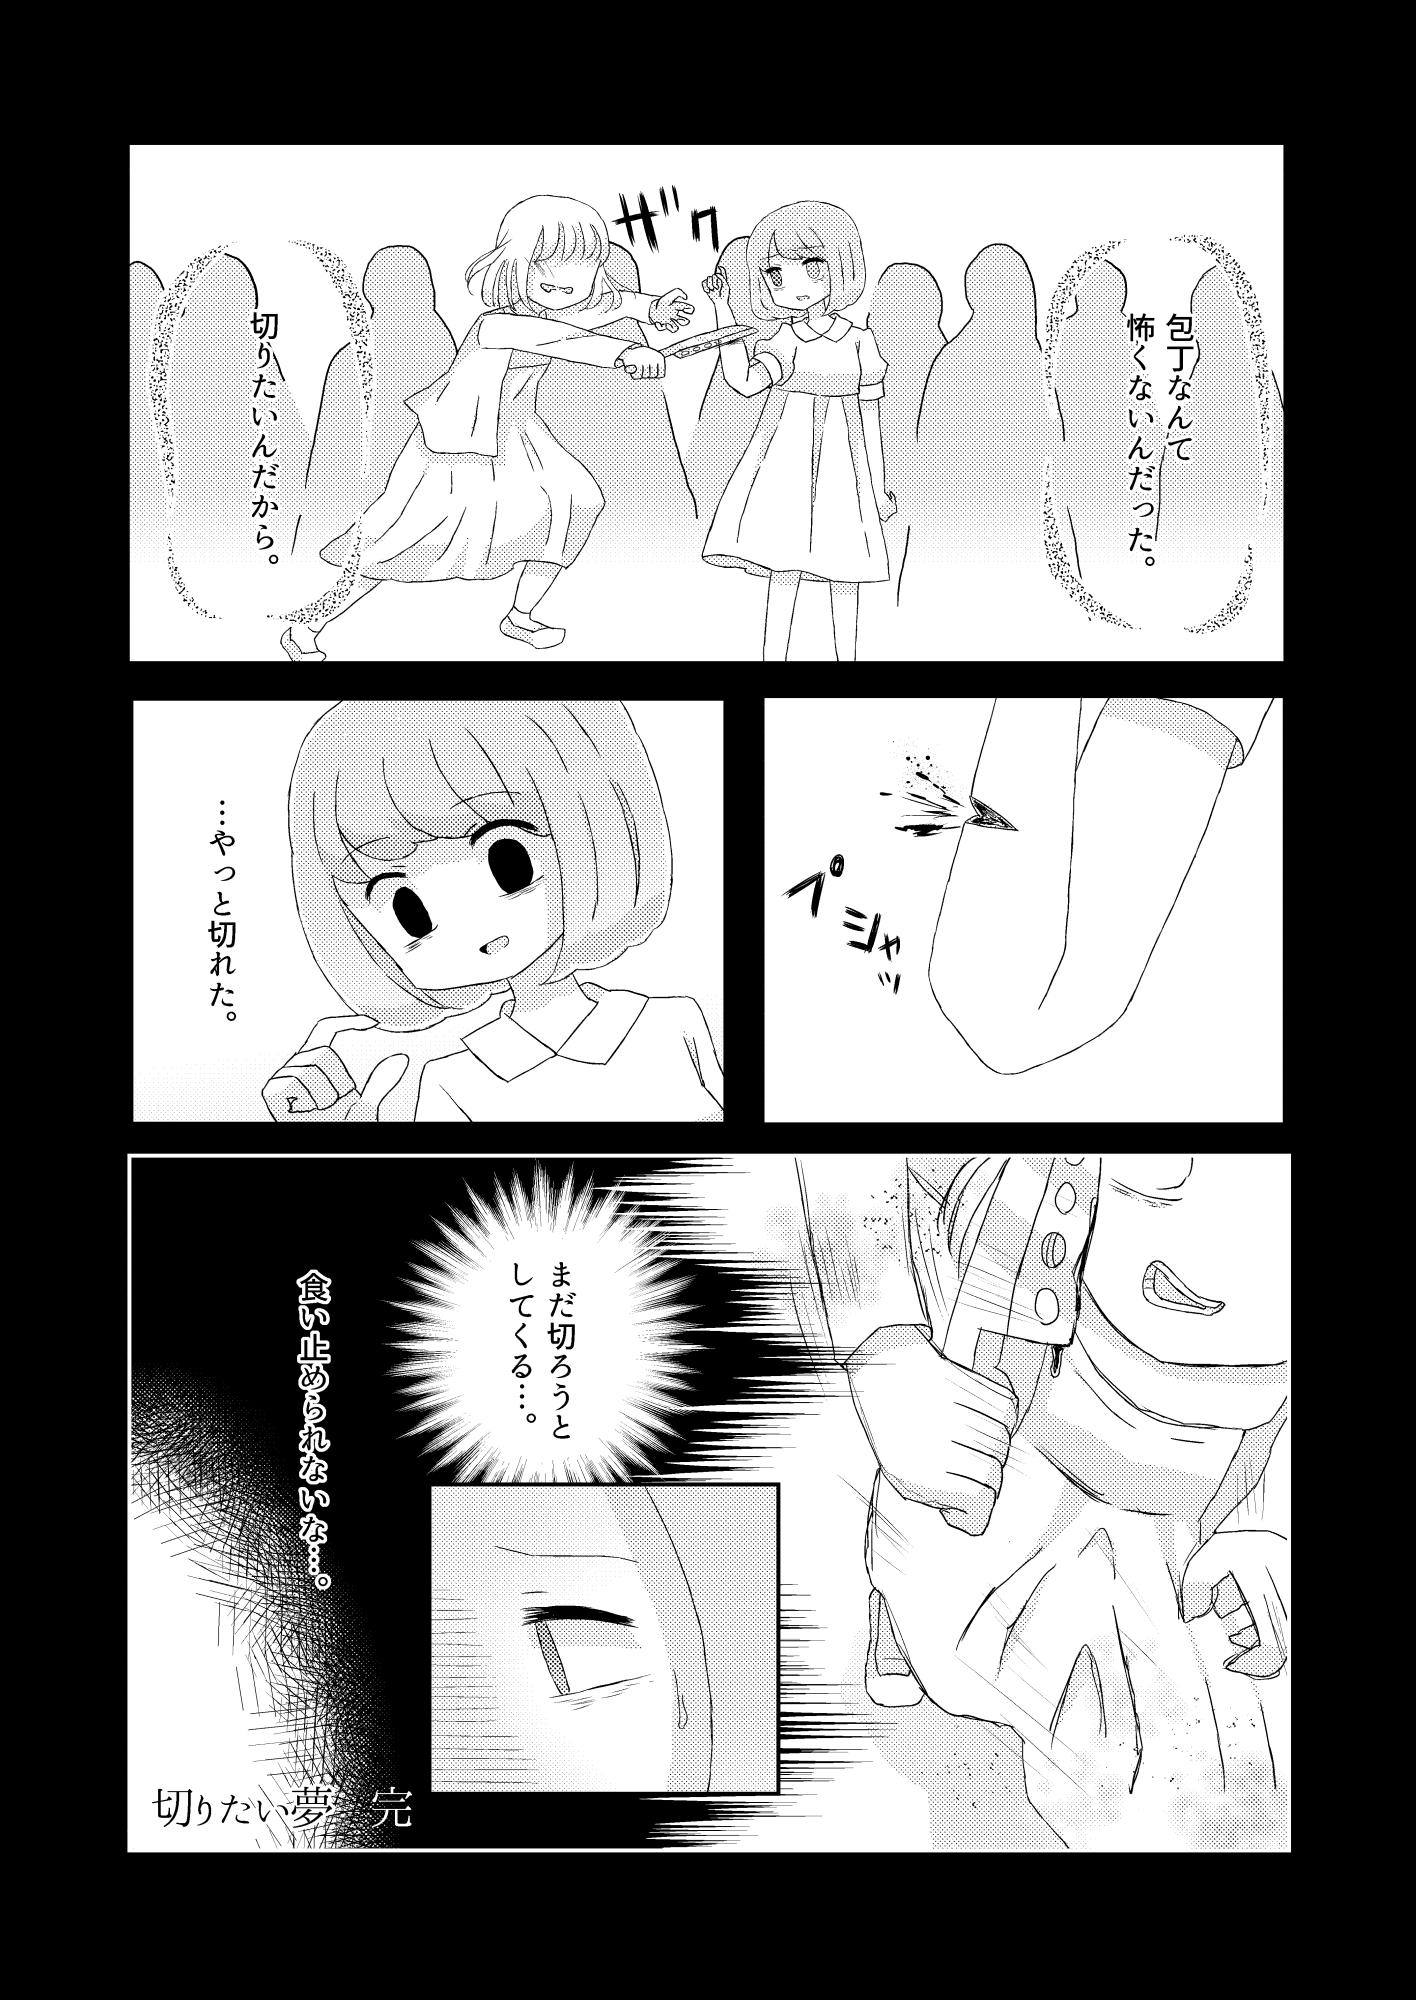 f:id:akumu-hinageshi:20190216115204p:plain